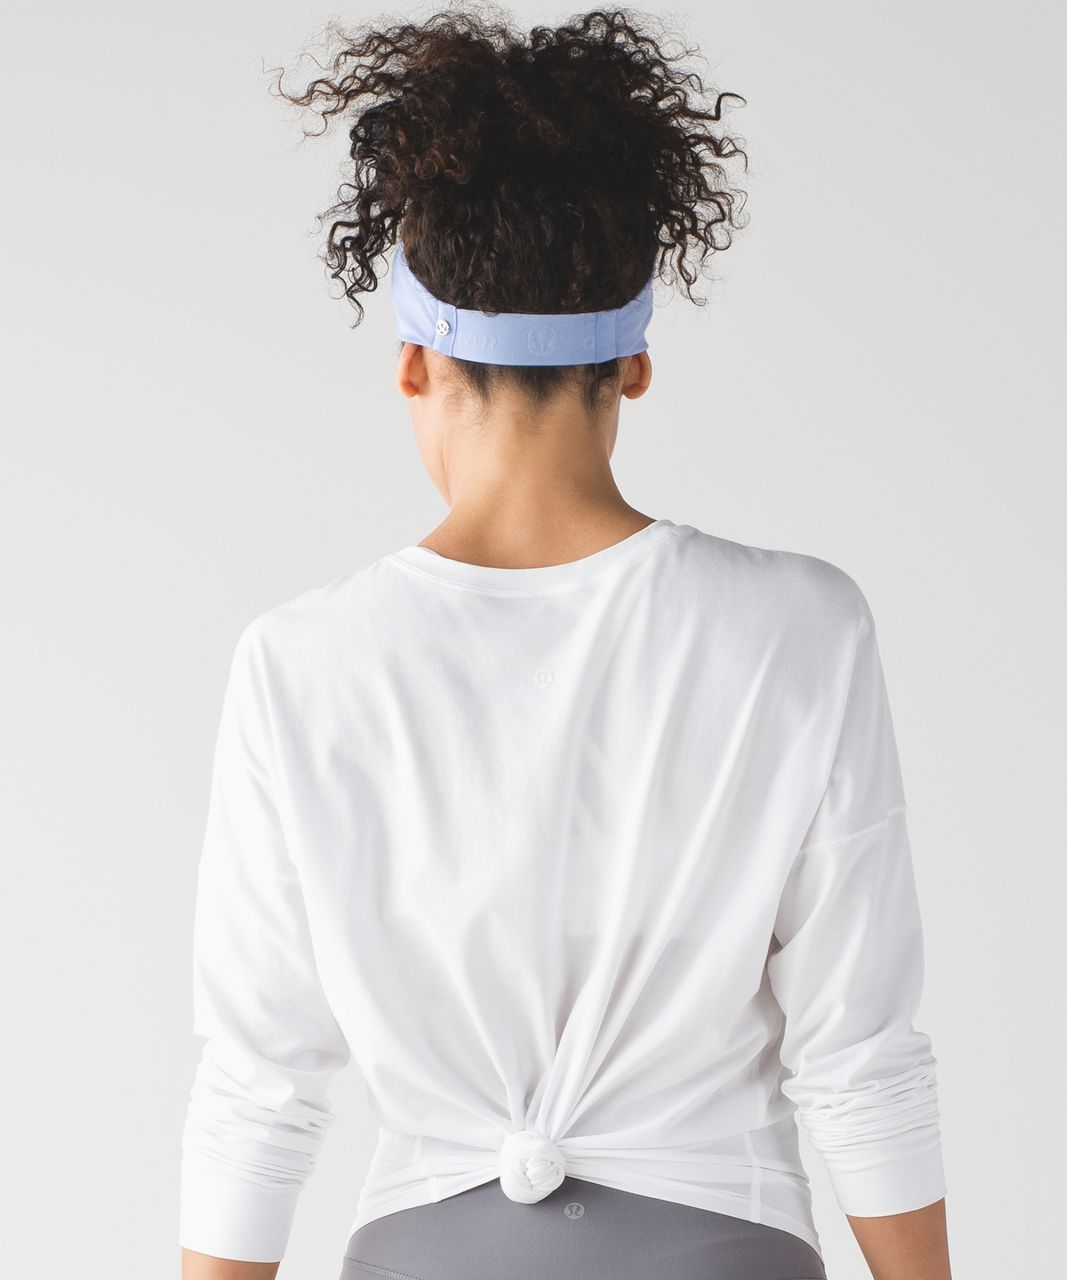 Lululemon Fringe Fighter Headband - Lavender Dusk / Heathered Emperor Blue